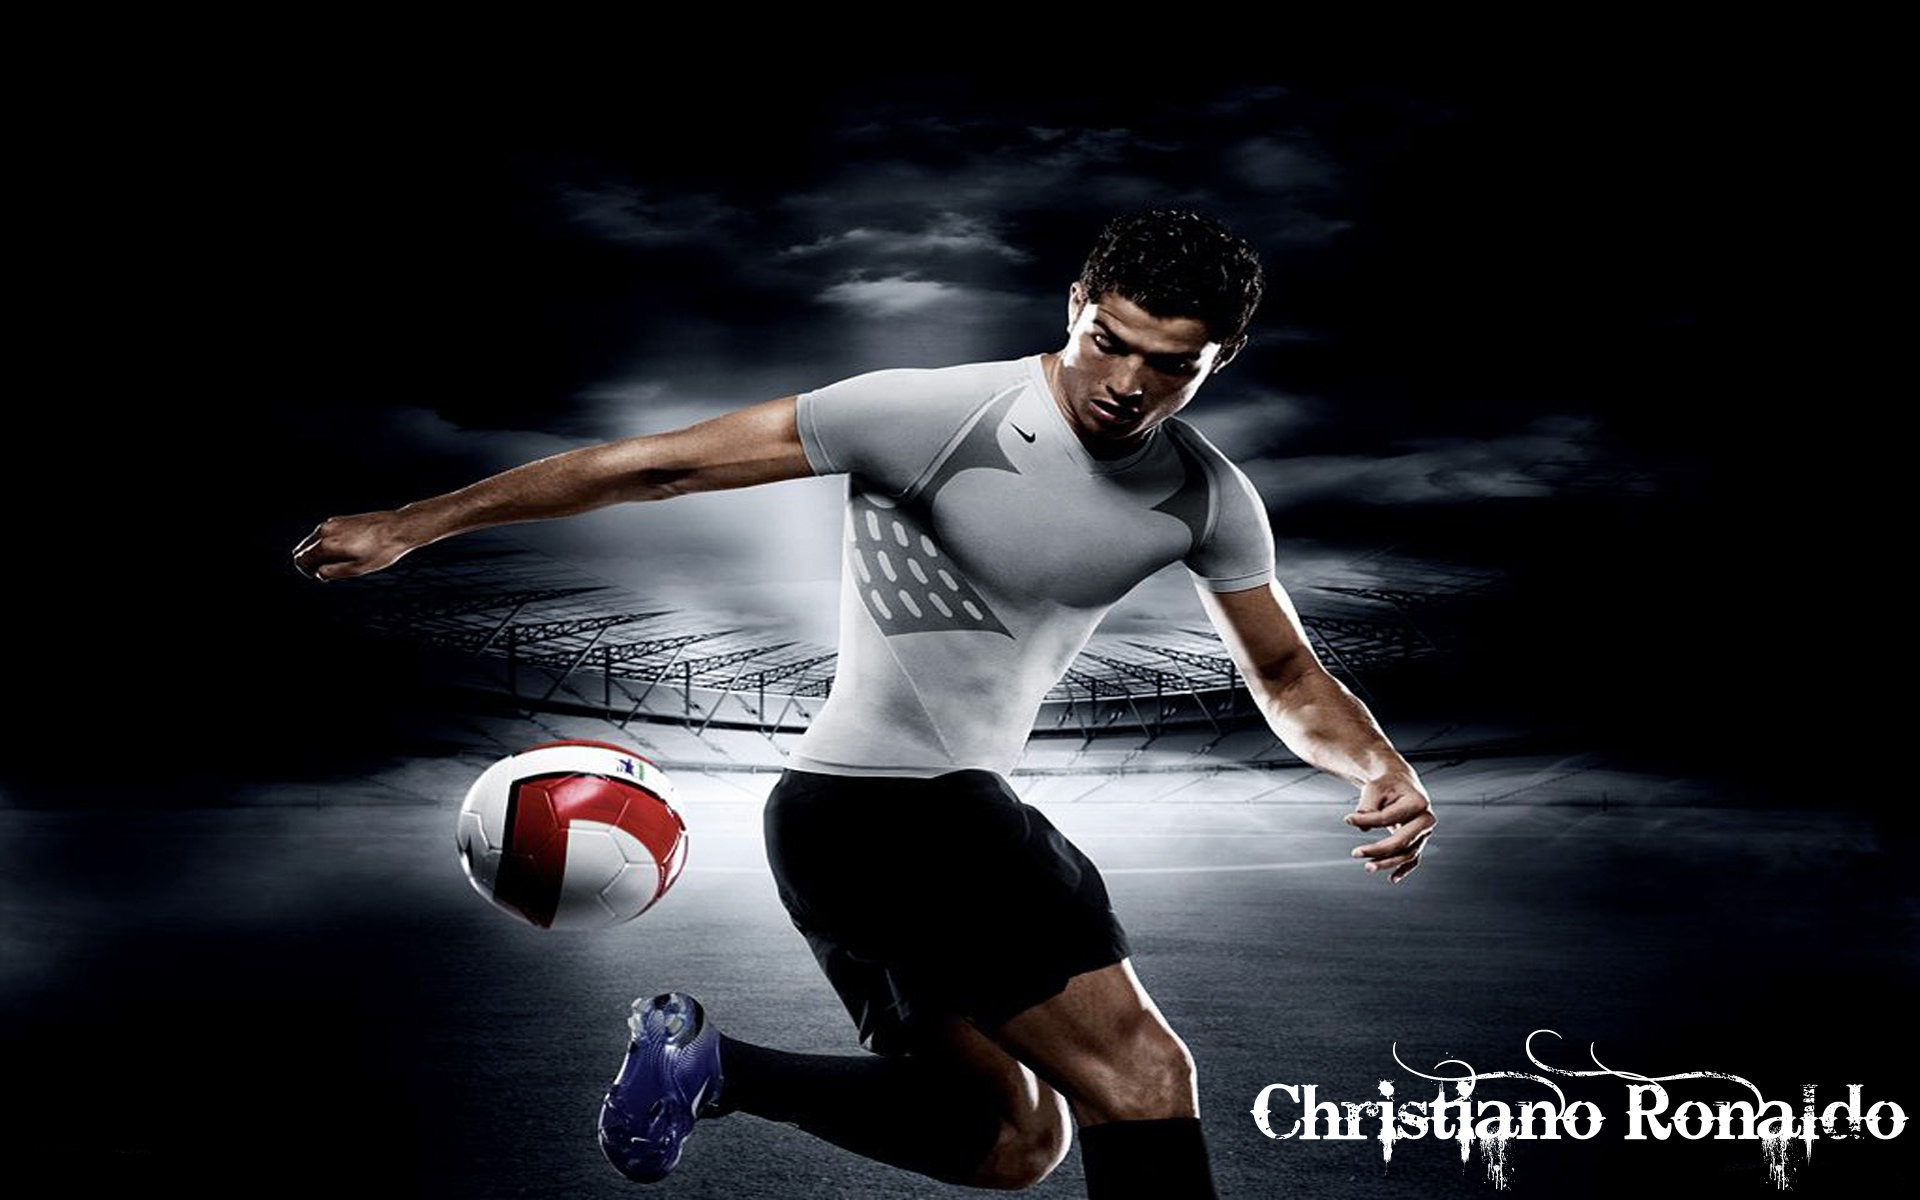 Cristiano Ronaldo Nike wallpaper   Cristiano Ronaldo Wallpapers 1920x1200